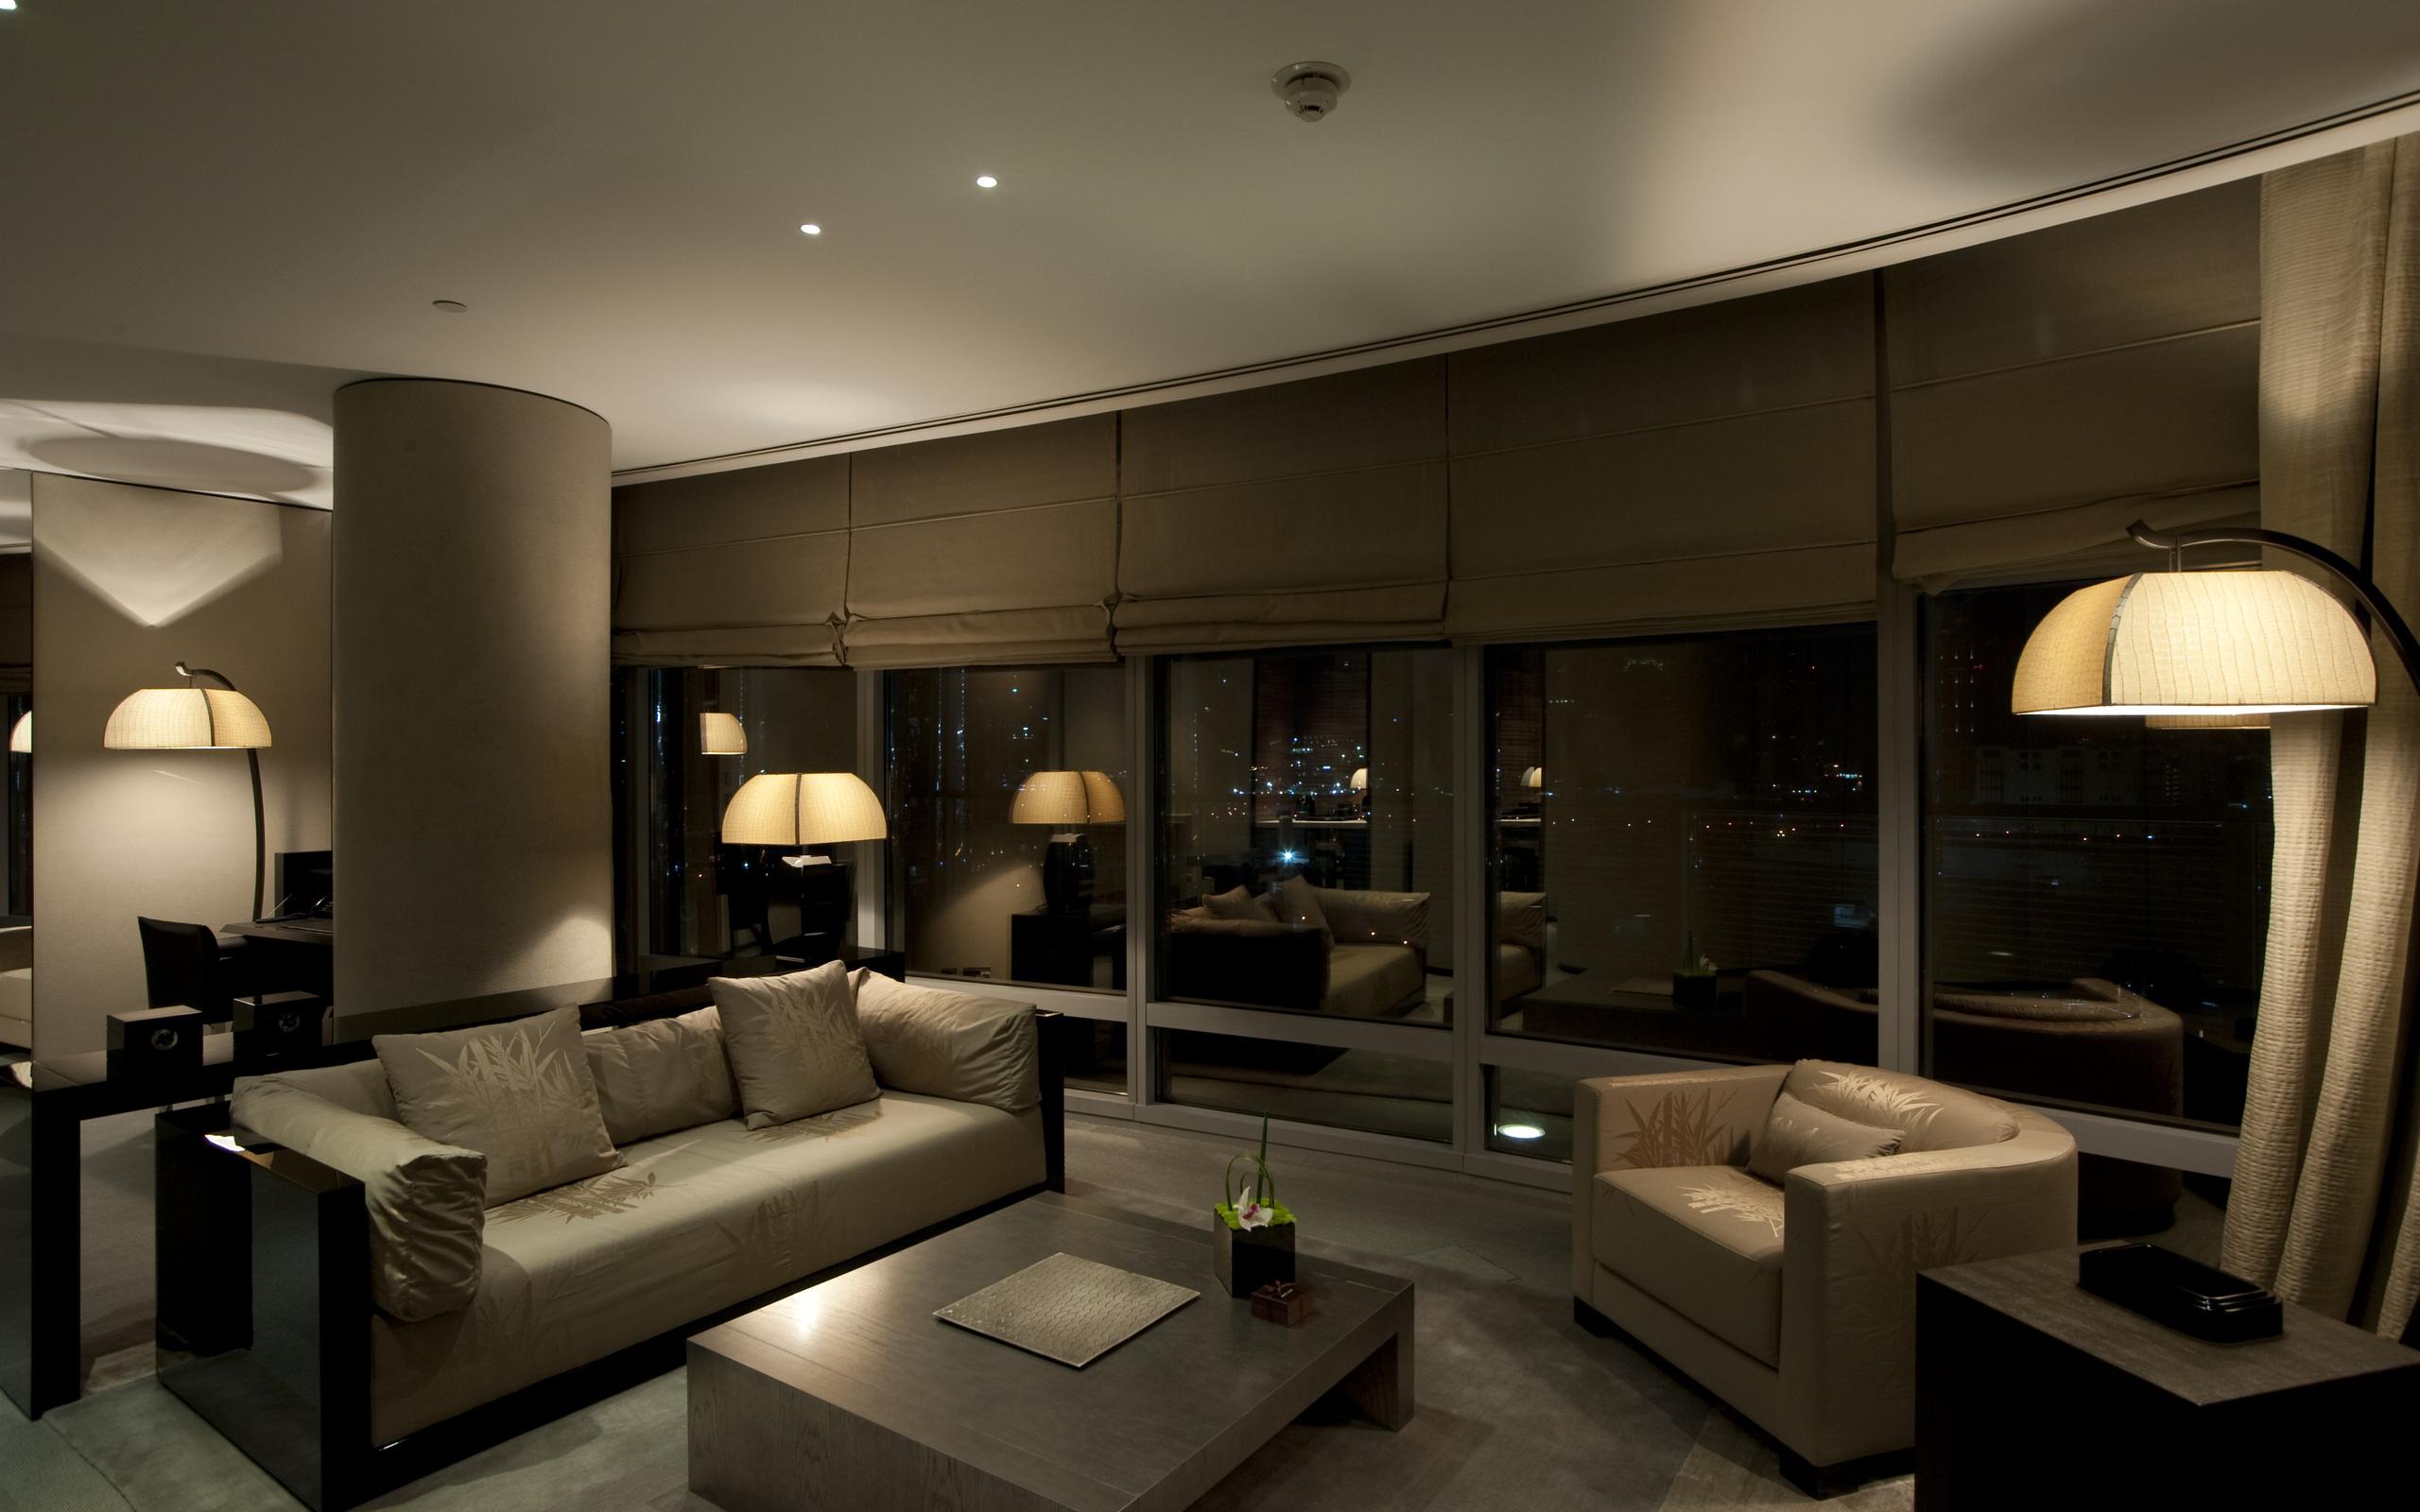 skaistas tumšas tapetes guļamistabas dizainā